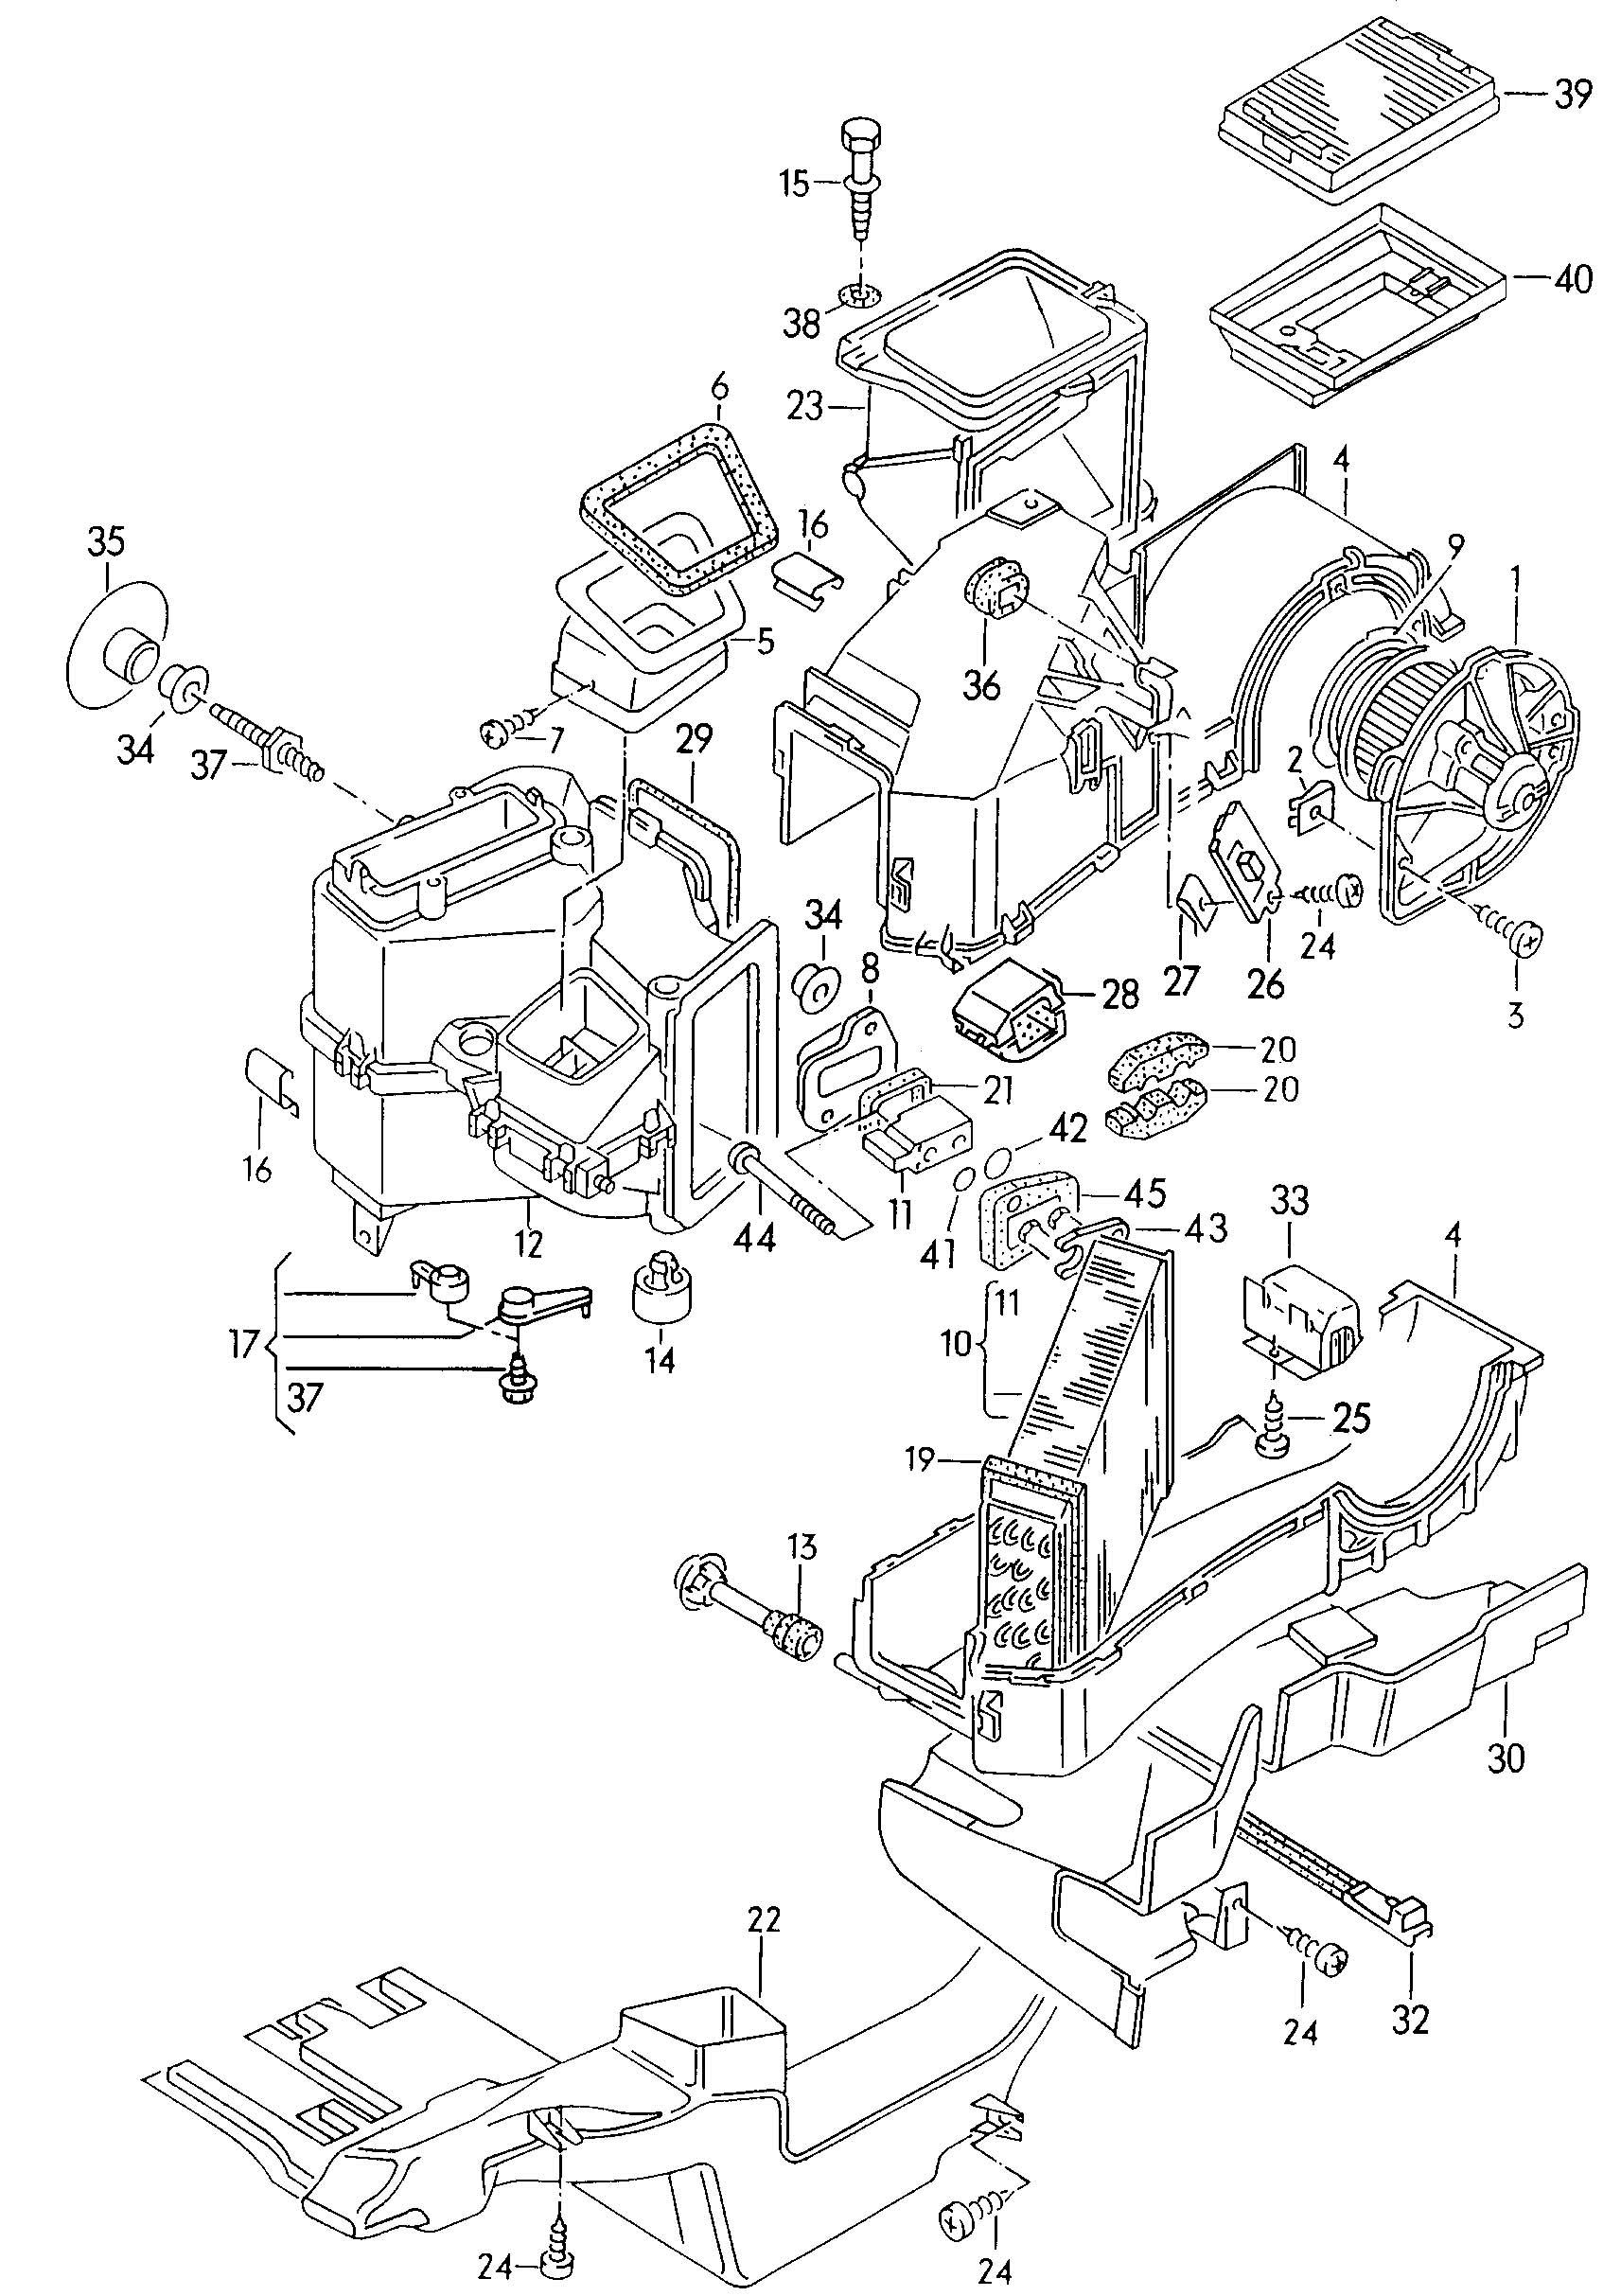 Volkswagen Passat Expansion Valve R134a Distribution